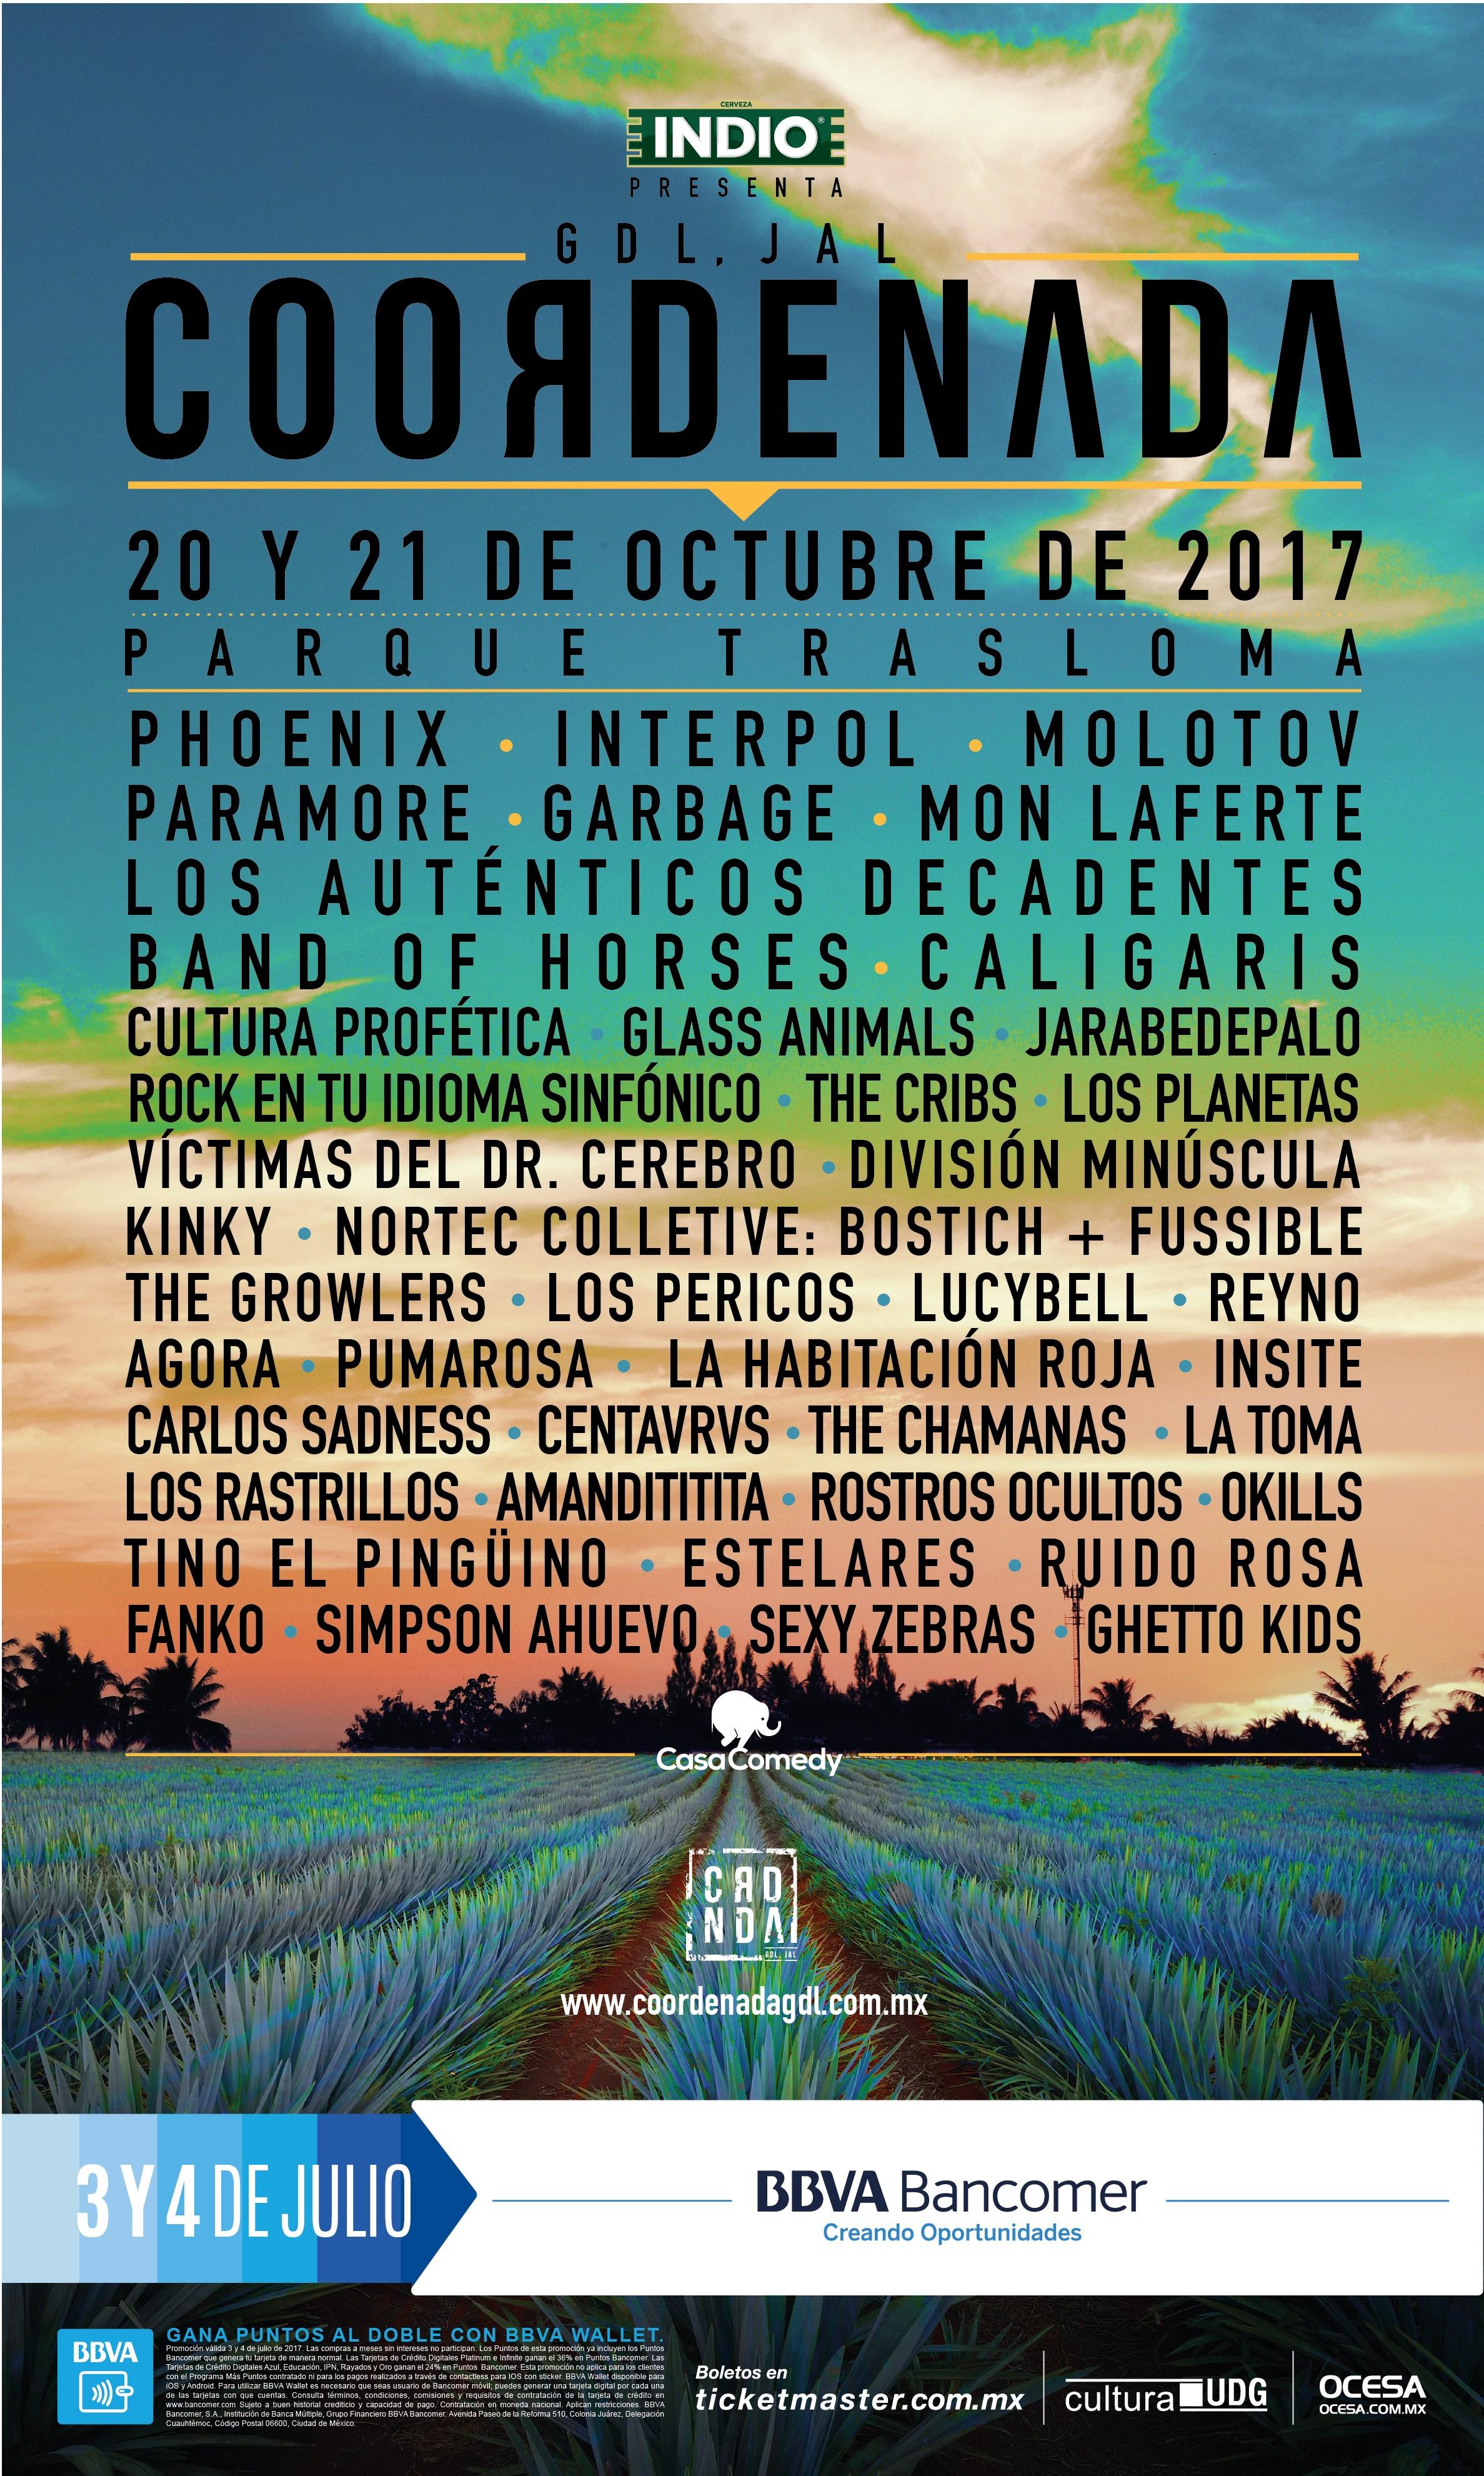 Coordenada-2017-1